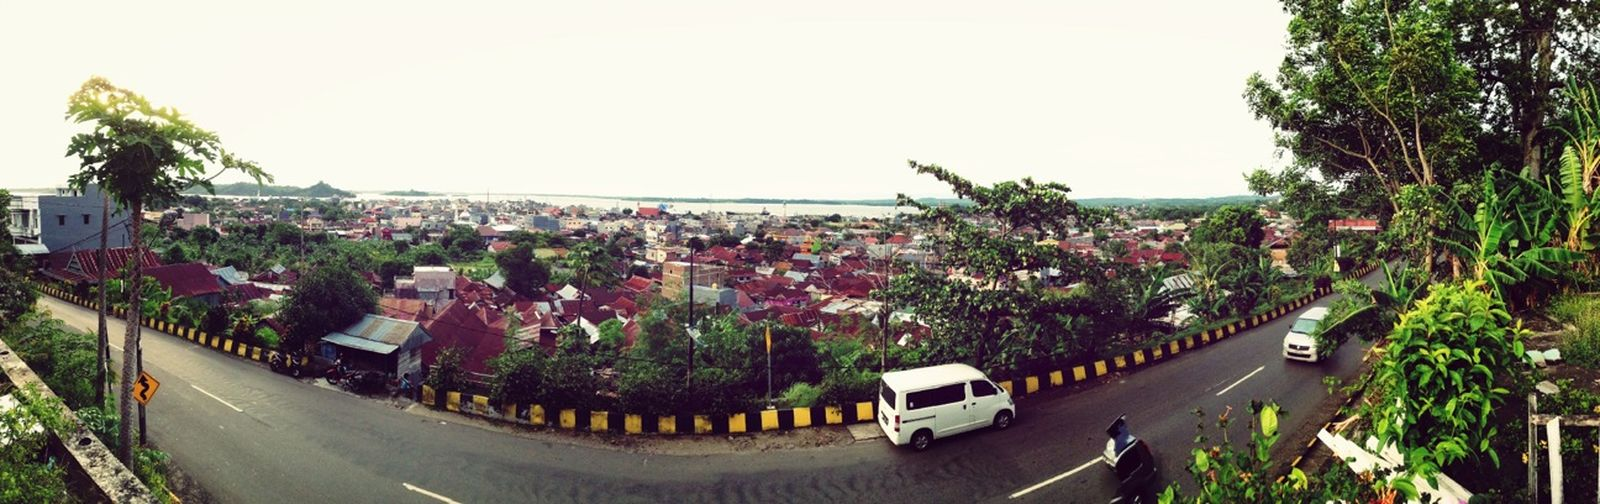 Panorama Time #iPhone5